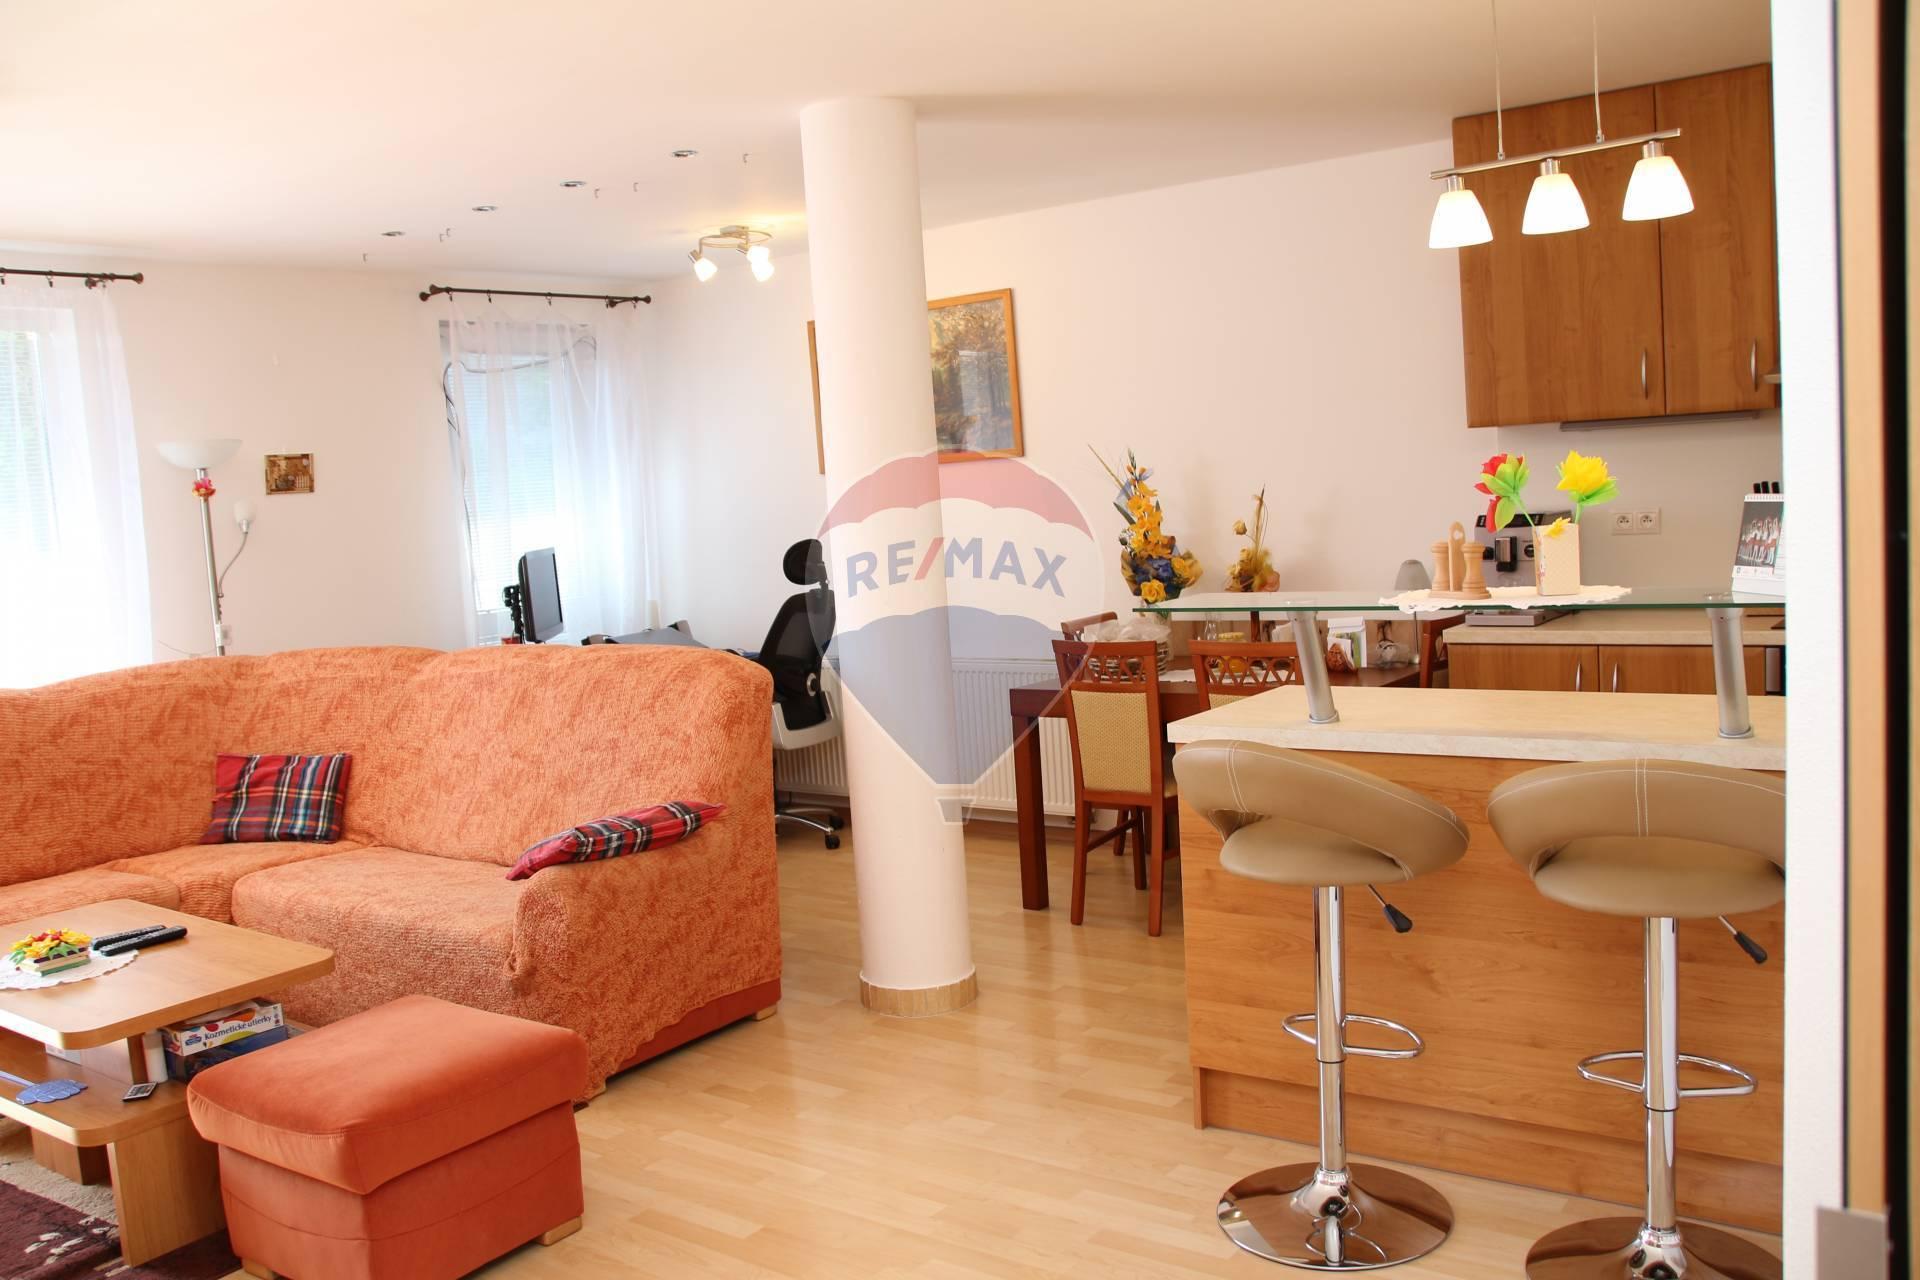 ZMENA CENY! PREDAJ 3 izb.bytu, novostavba, centrum, Pivničná ul., Senec